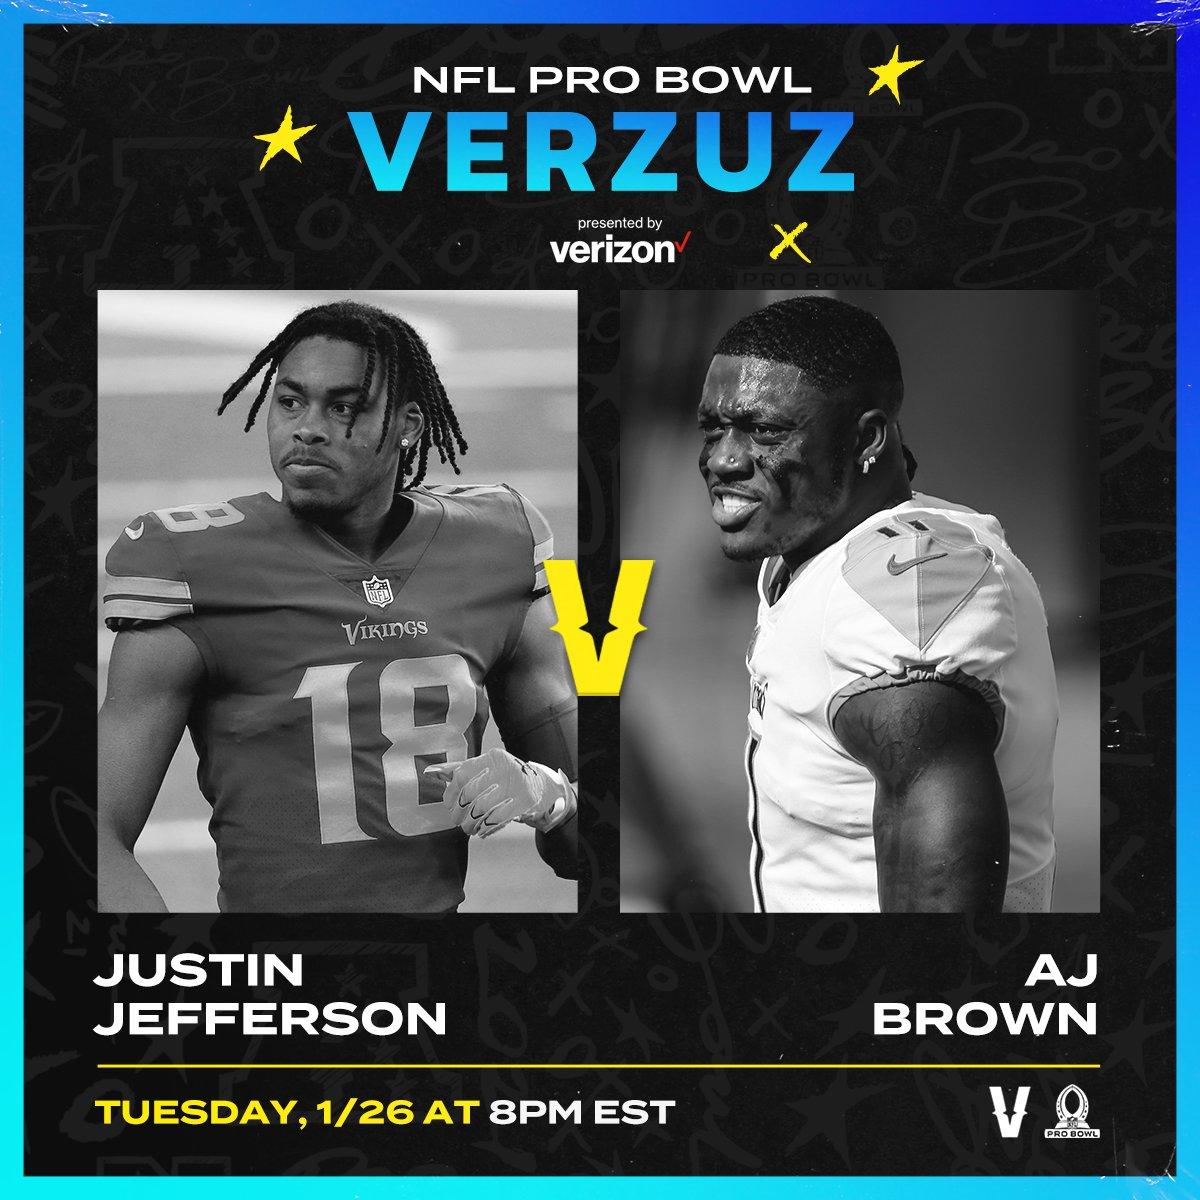 TONIGHT: @JJettas2 vs. @1kalwaysopen_ in the first edition of #NFLProBowlVerzuz!  8pm ET | Live on NFL Twitter @verzuzonline